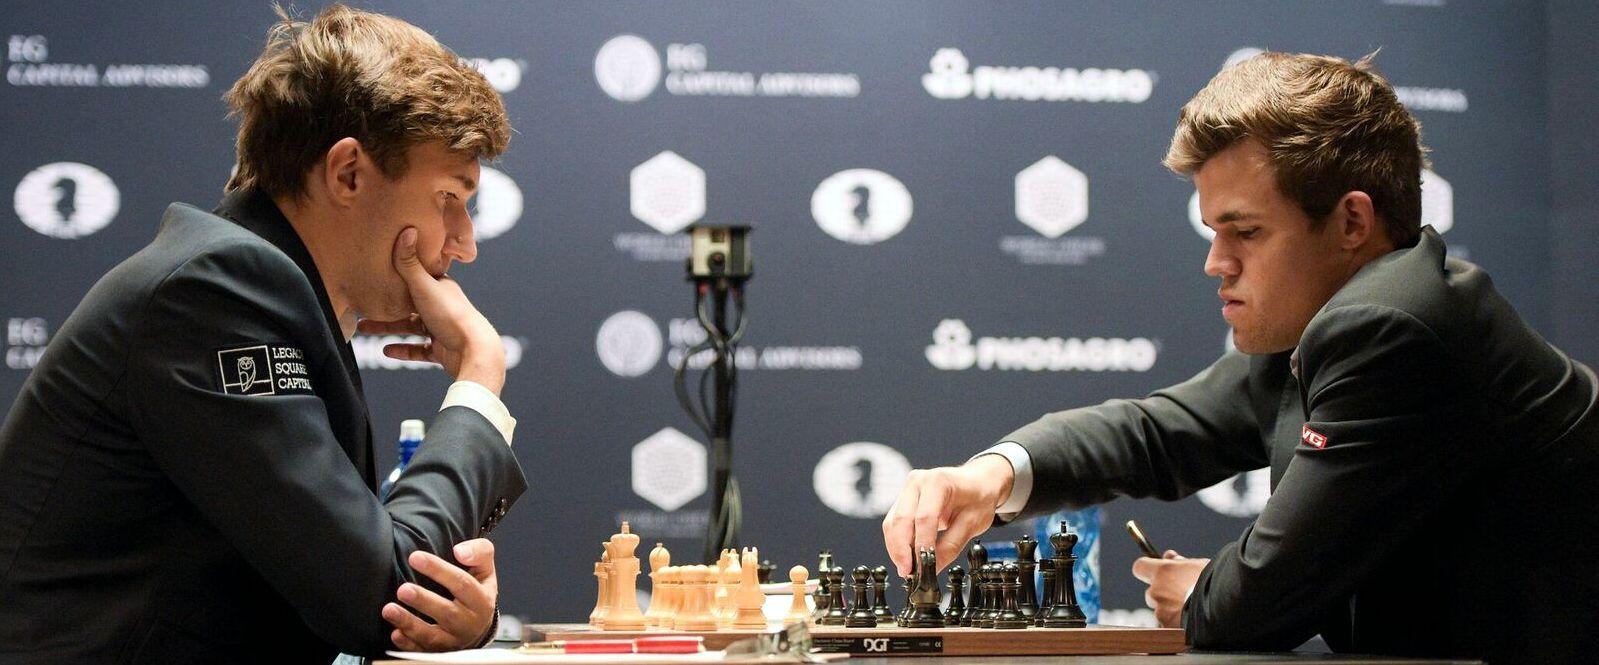 Sergey Karjakin et Magnus Carlsen pendant la ronde 2